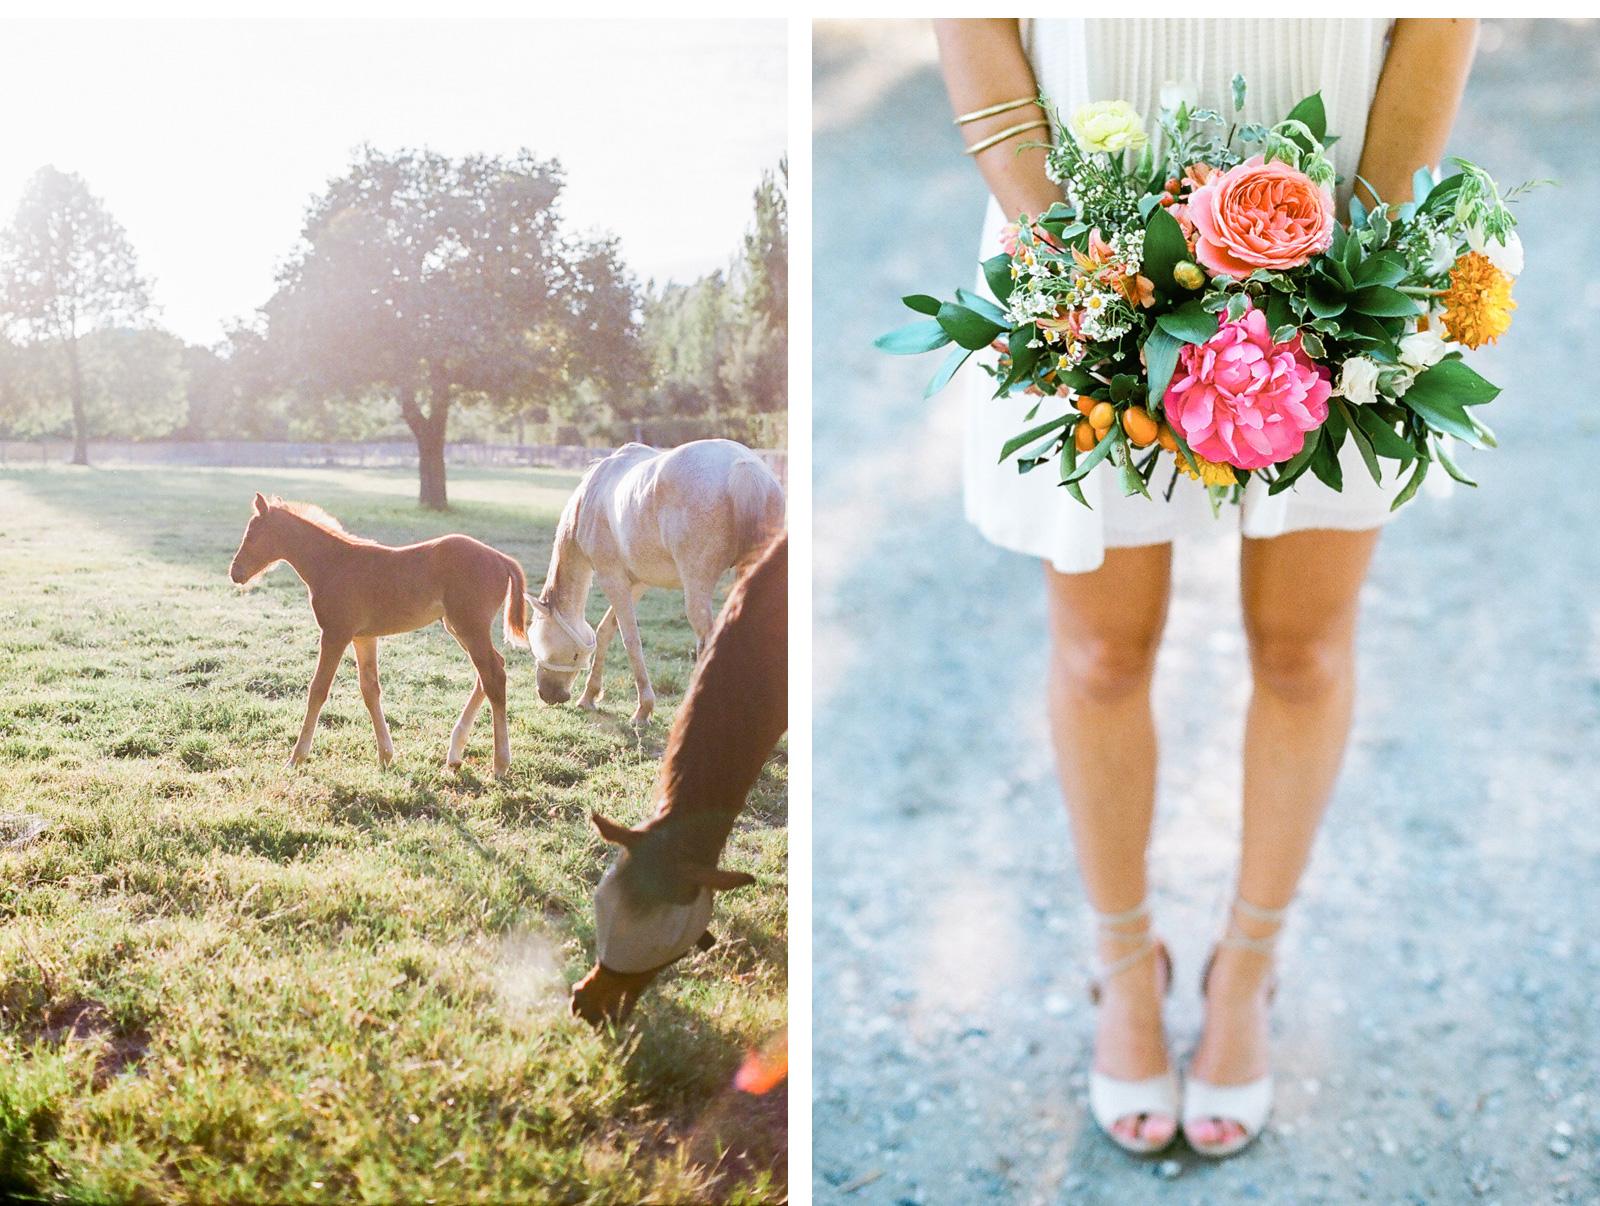 Whispering-Rose-Ranch-Wedding-Natalie-Schutt-Fine-Art-Photography-Style-Me-Pretty_02.jpg